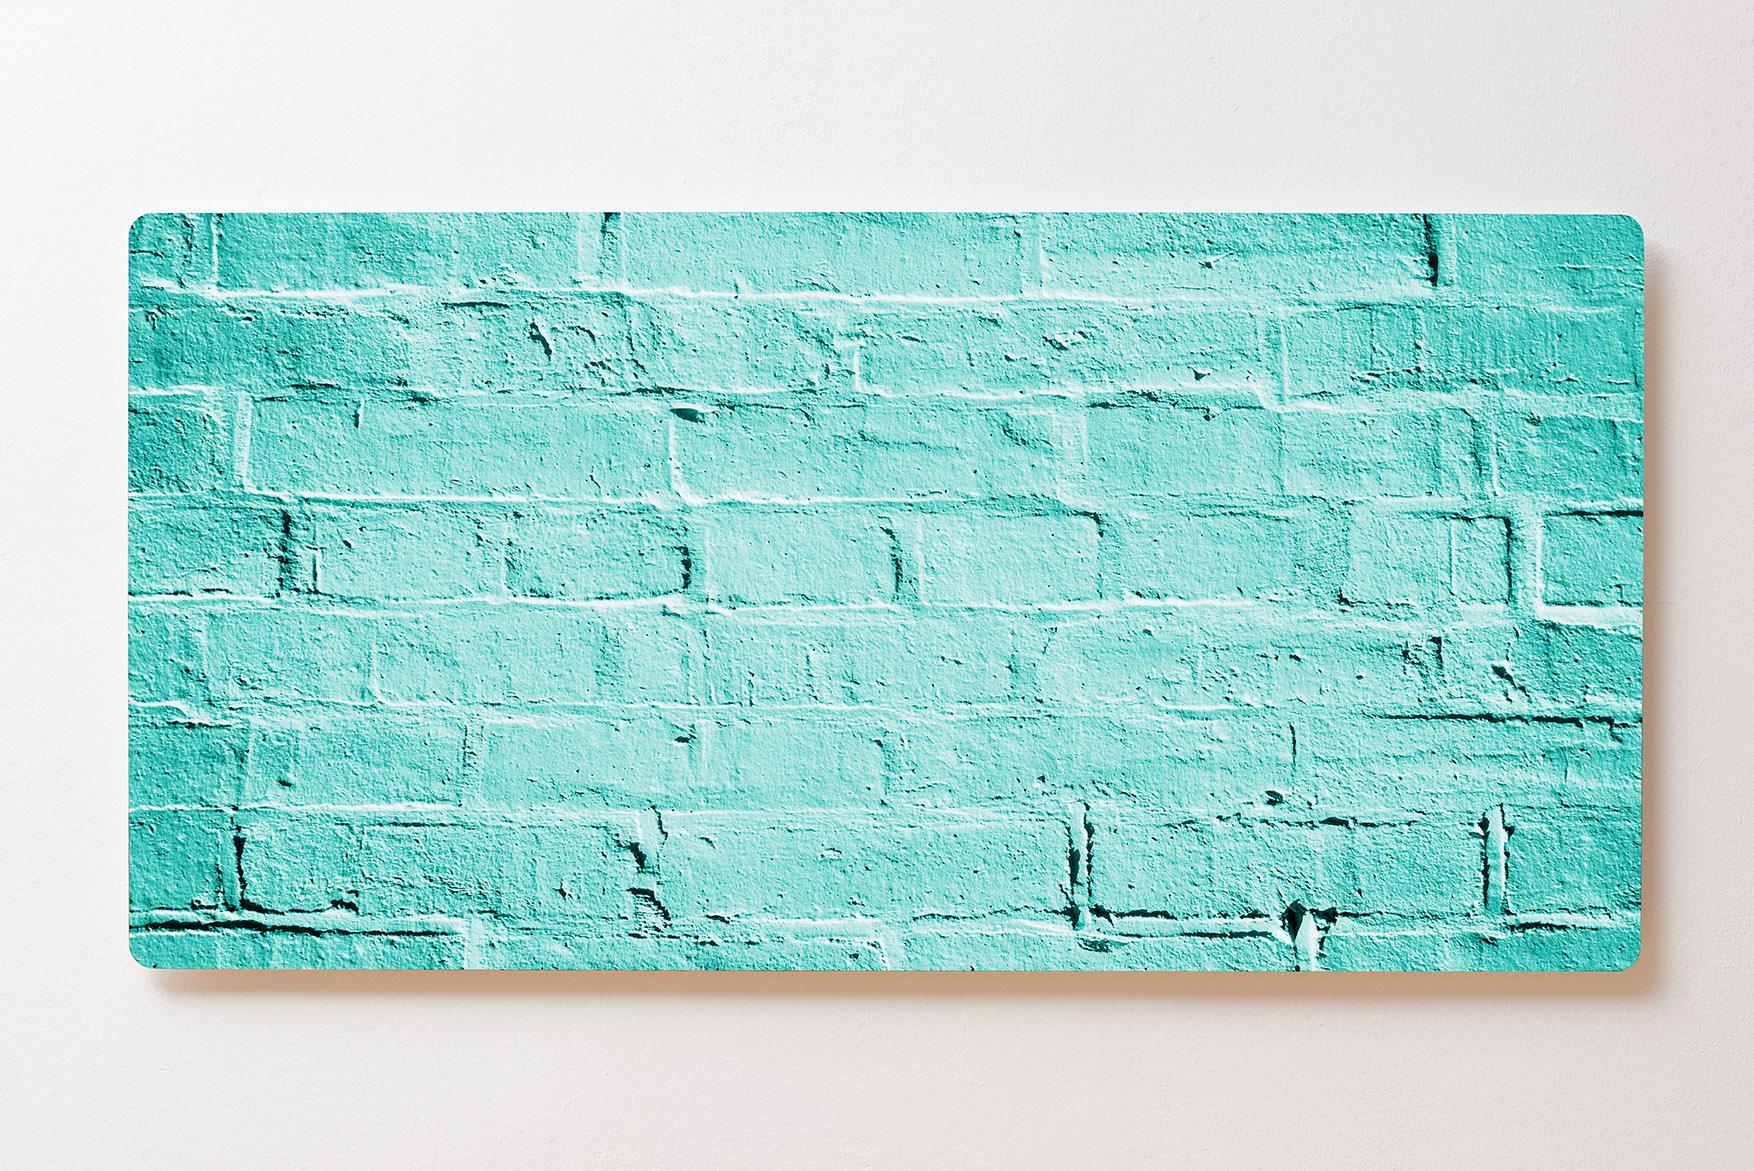 Magnettafel BACKLIGHT 120x60cm Motiv-Wandbild M134 Häuserwand Türkis